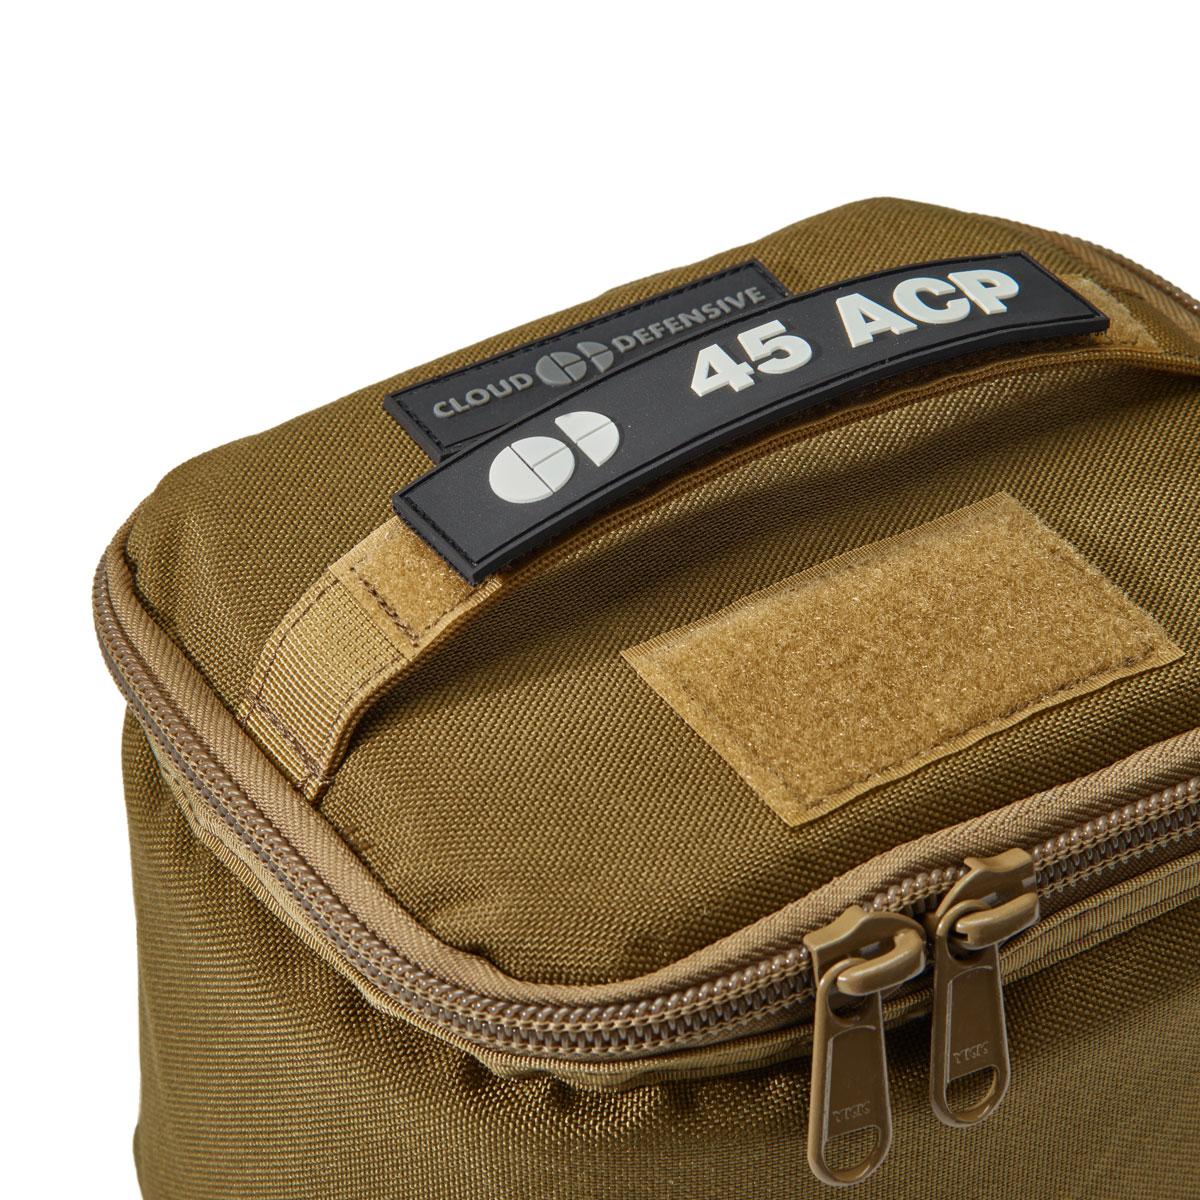 Cloud Defensive Ammo Patch 45 ACP Velcro